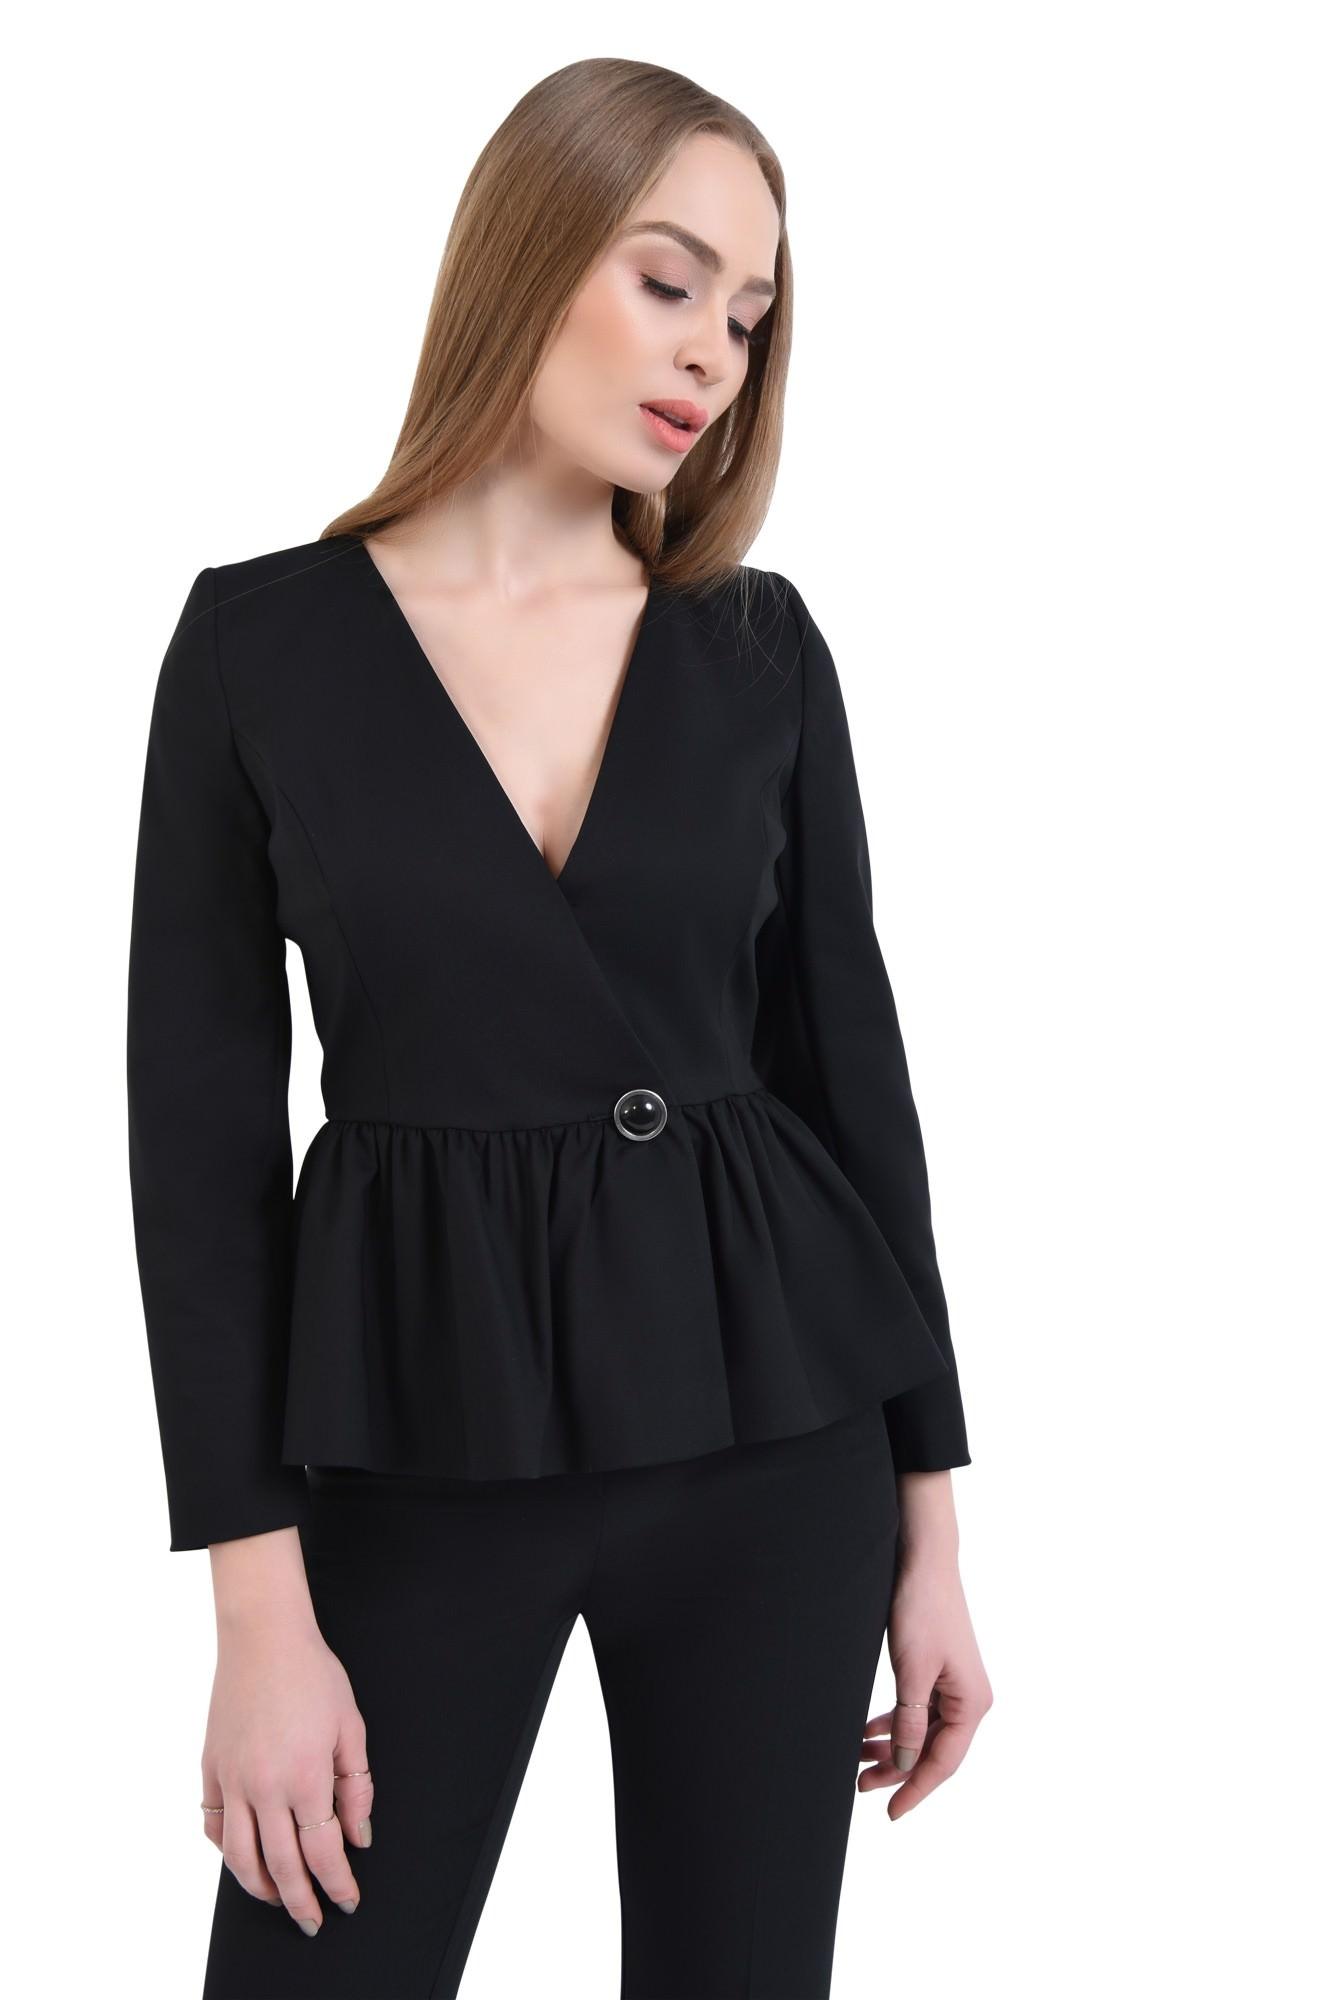 0 - Sacou casual, negru